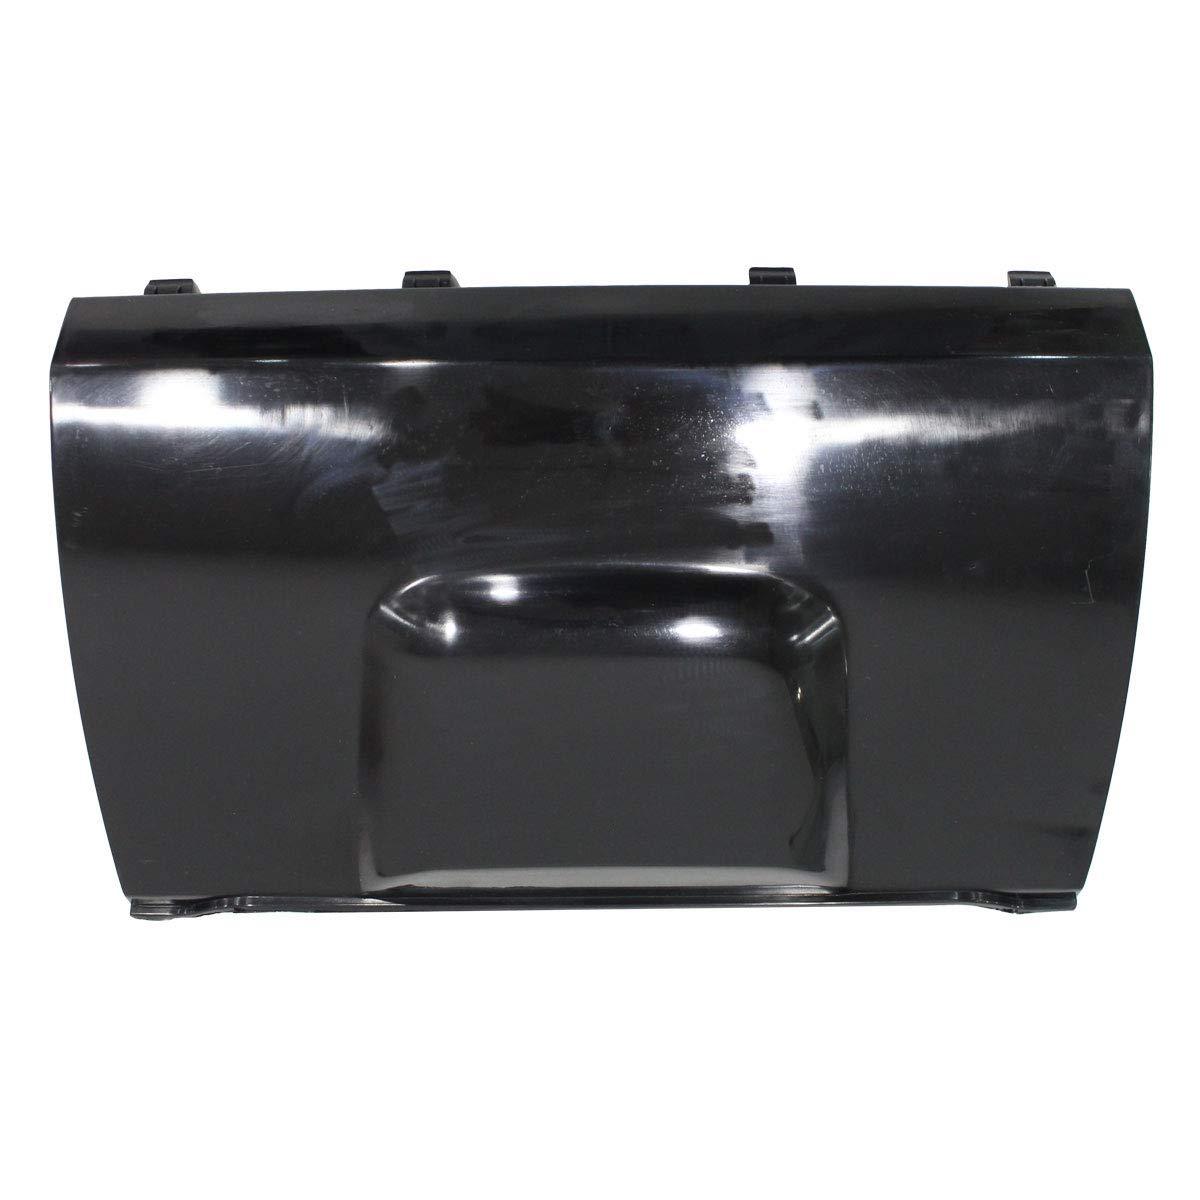 NewYall Rear Bumper Tow Hook Cover Cap